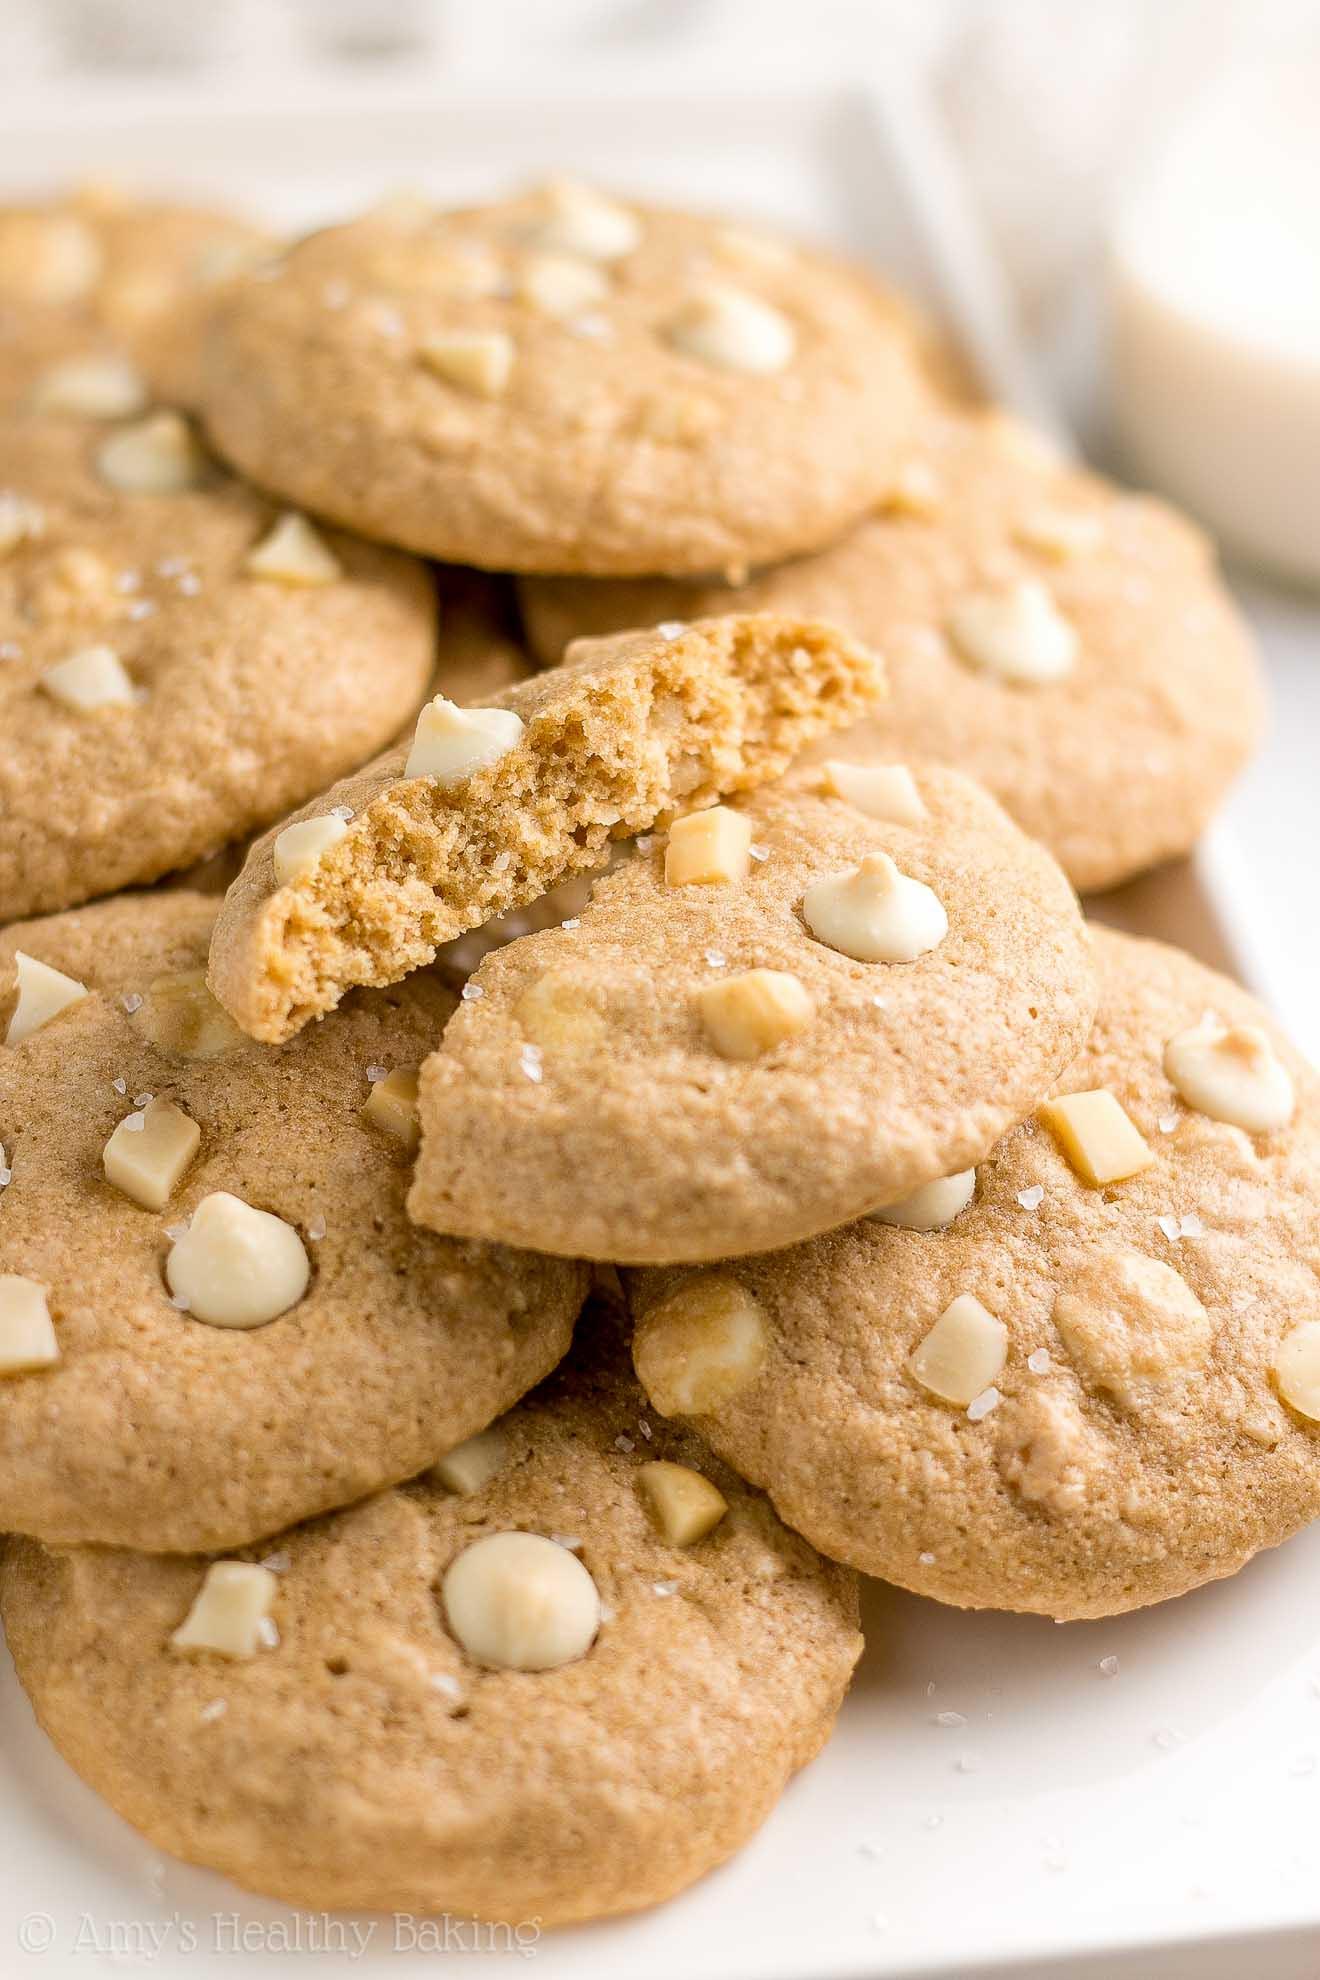 Macadamia Nut Cookies  The Ultimate Healthy White Chocolate Macadamia Nut Cookies